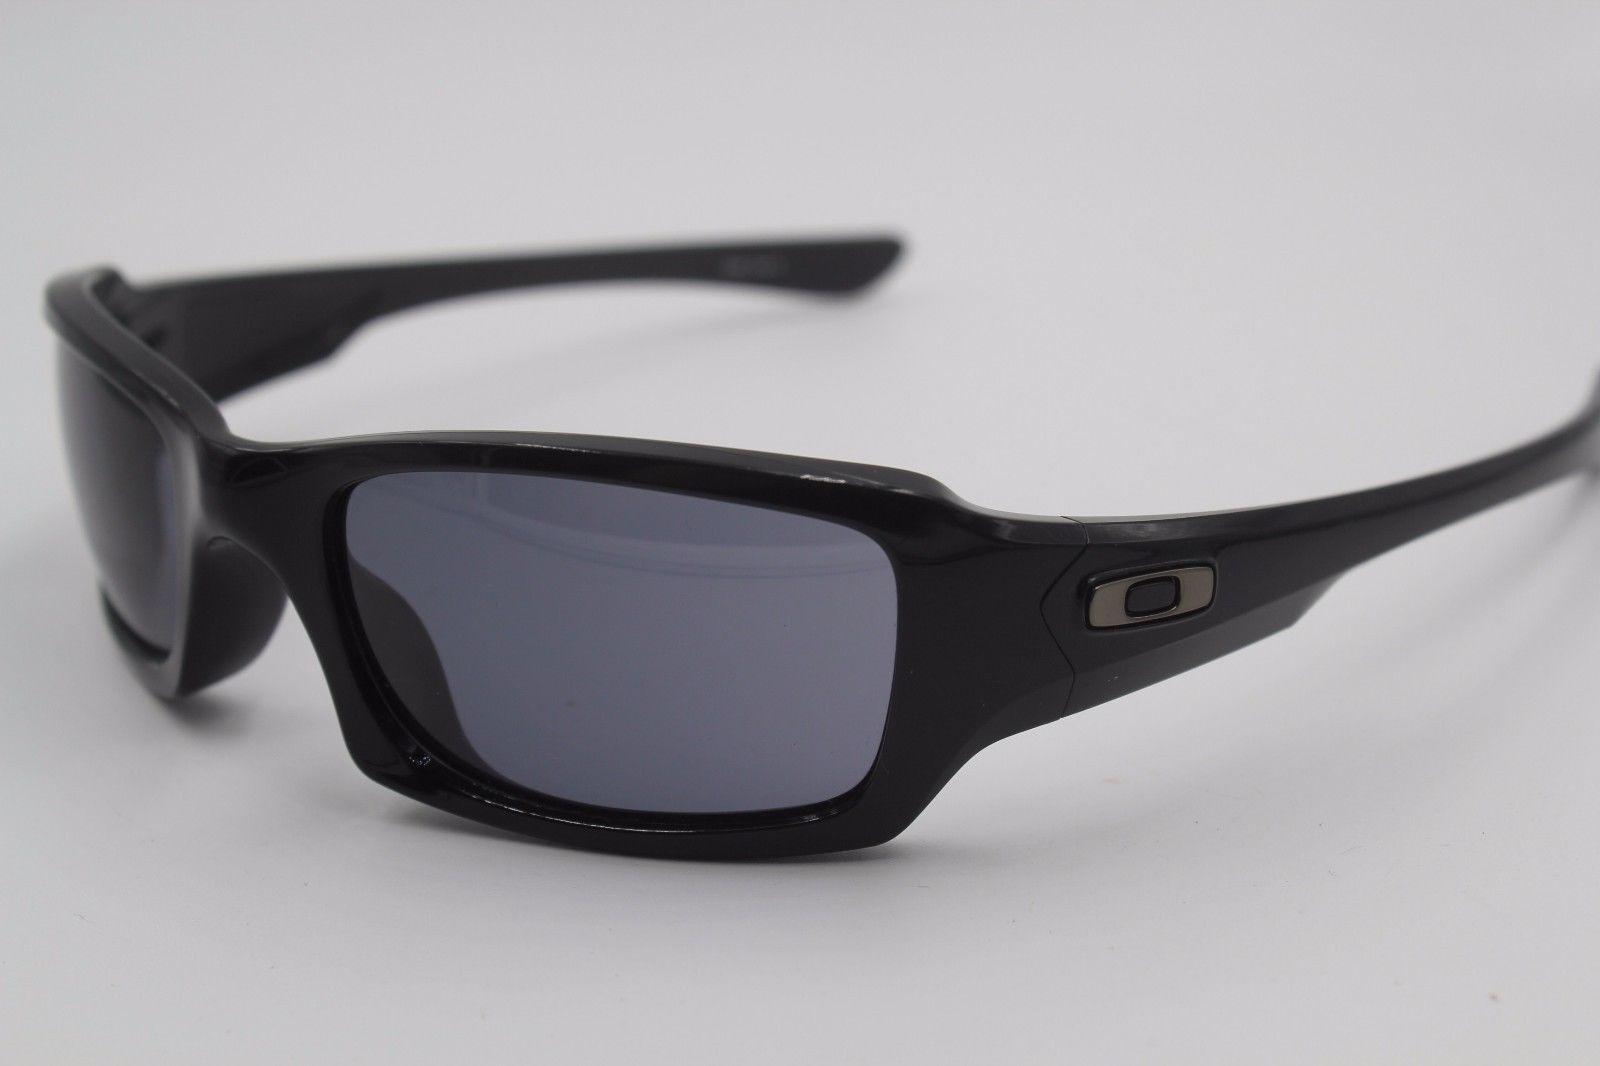 oakley sunglasses oo 03 440 black 4 1 2 authentic